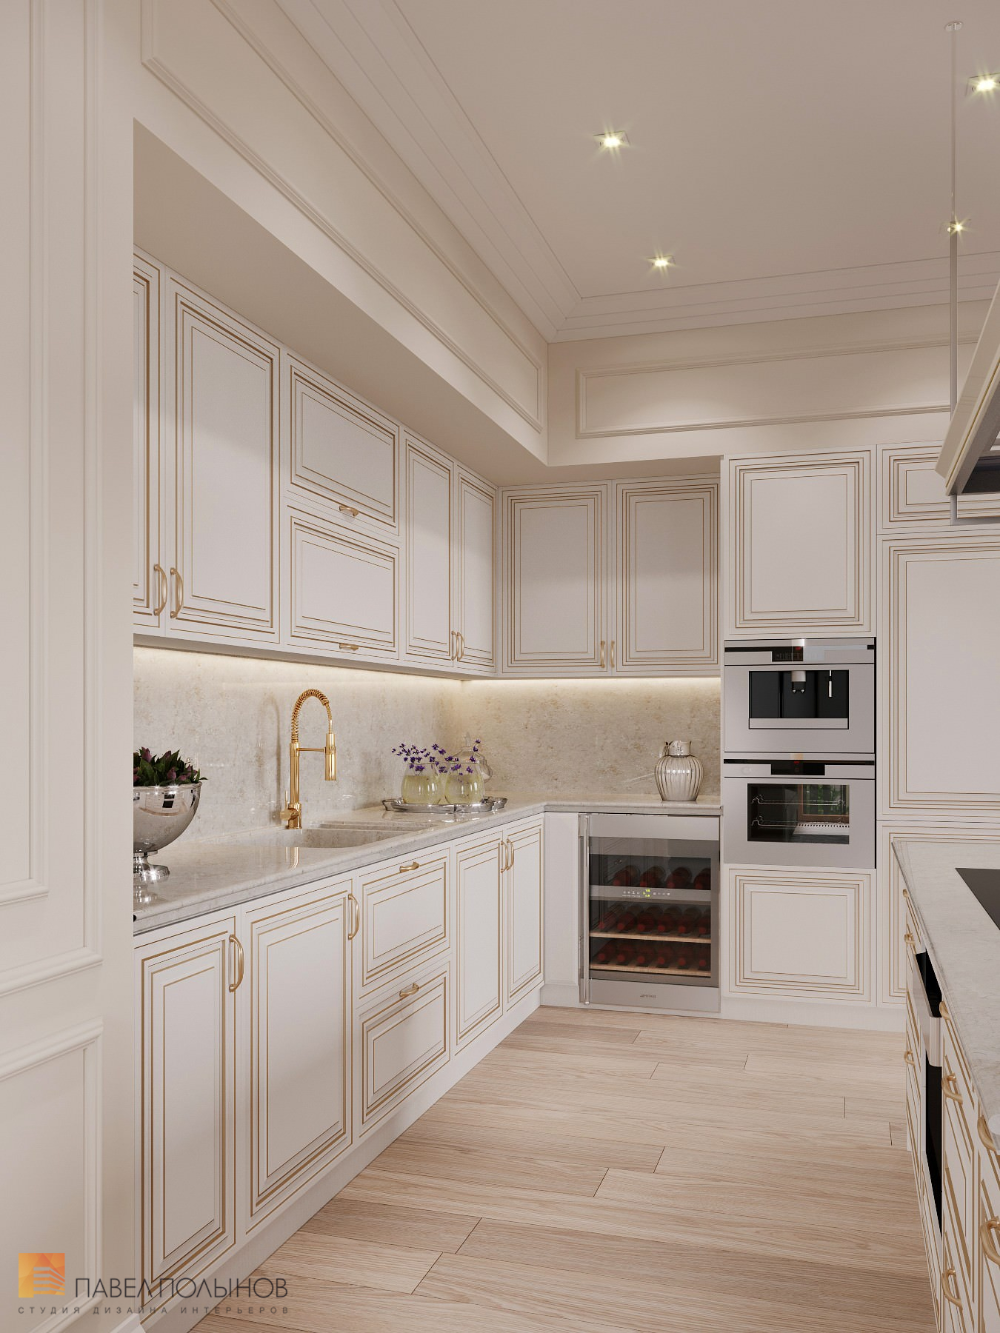 Фото: Интерьер кухни - Квартира в стиле современно